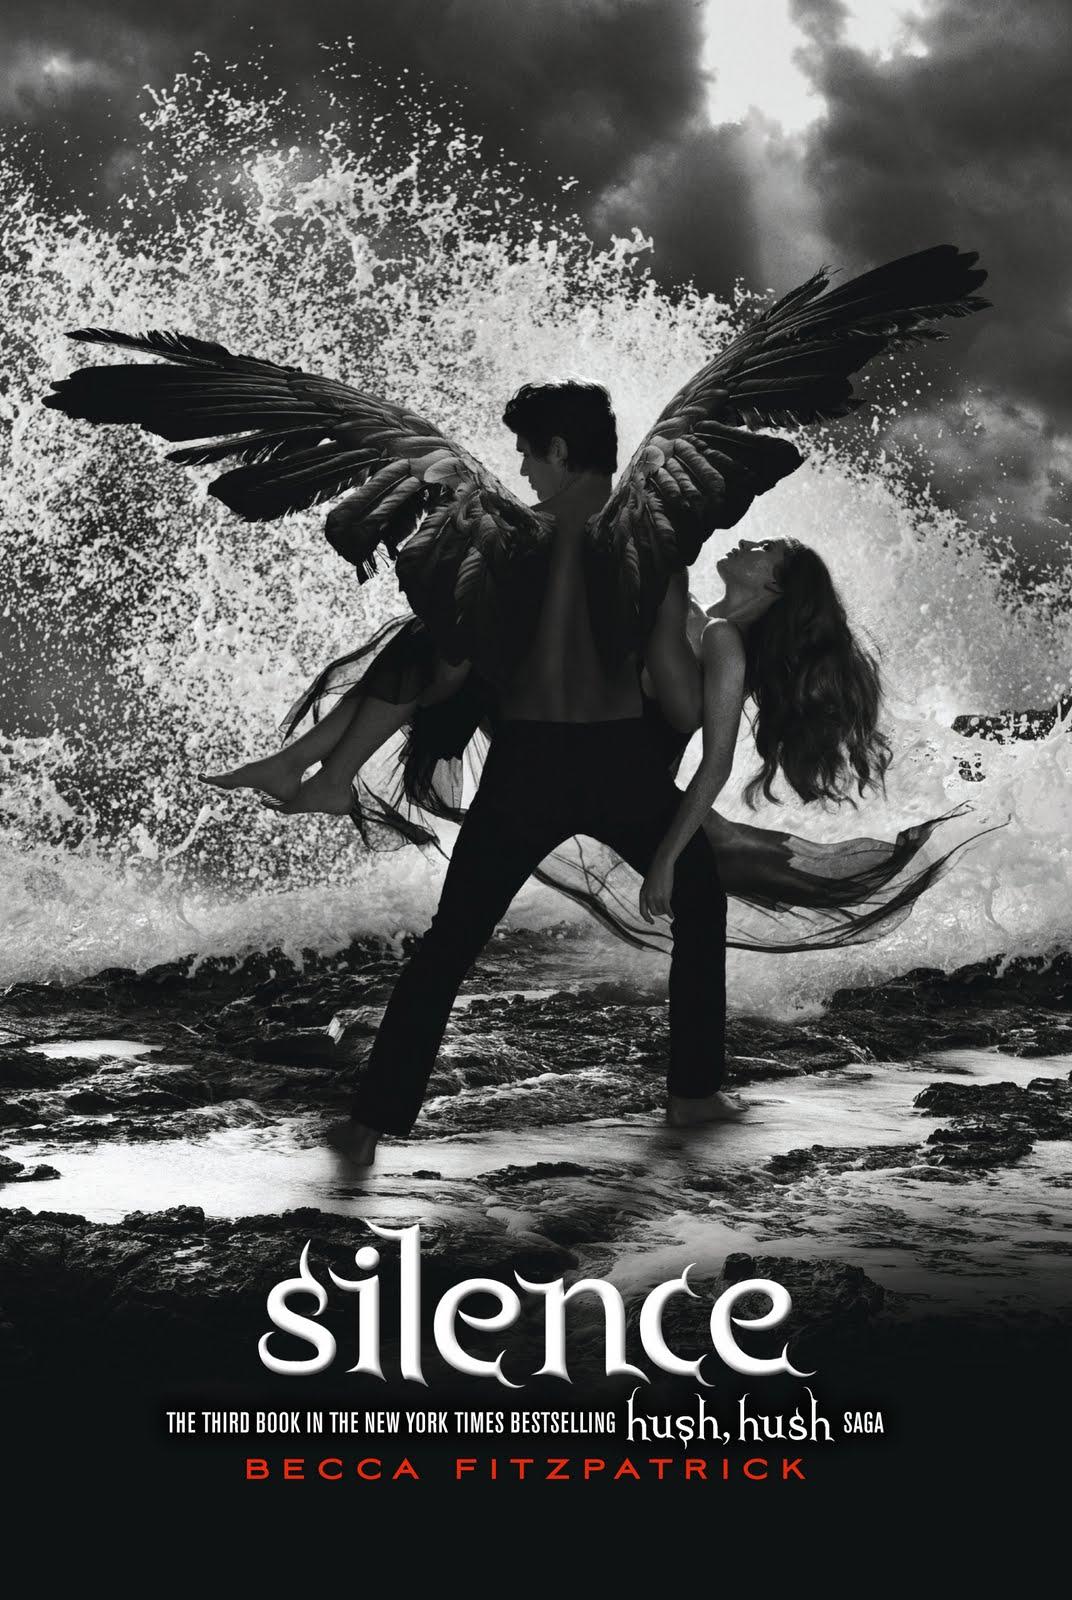 Silence | by: Becca Fitzpatrick. Silence is the newest installment in Becca  Fitzpatrick's Hush, Hush Saga ...